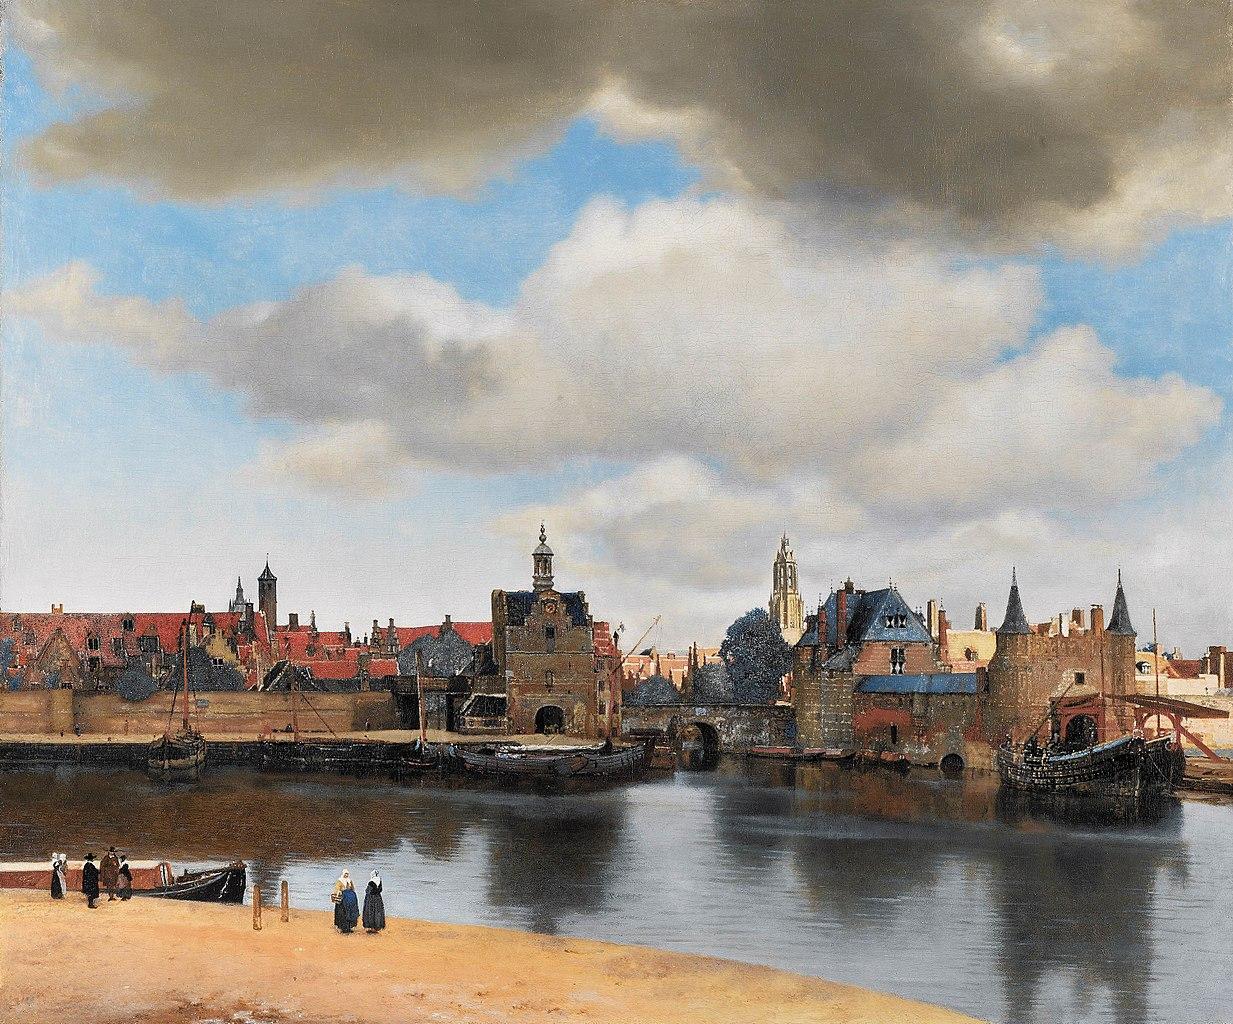 0000000 1233px-Vermeer-view-of-delft